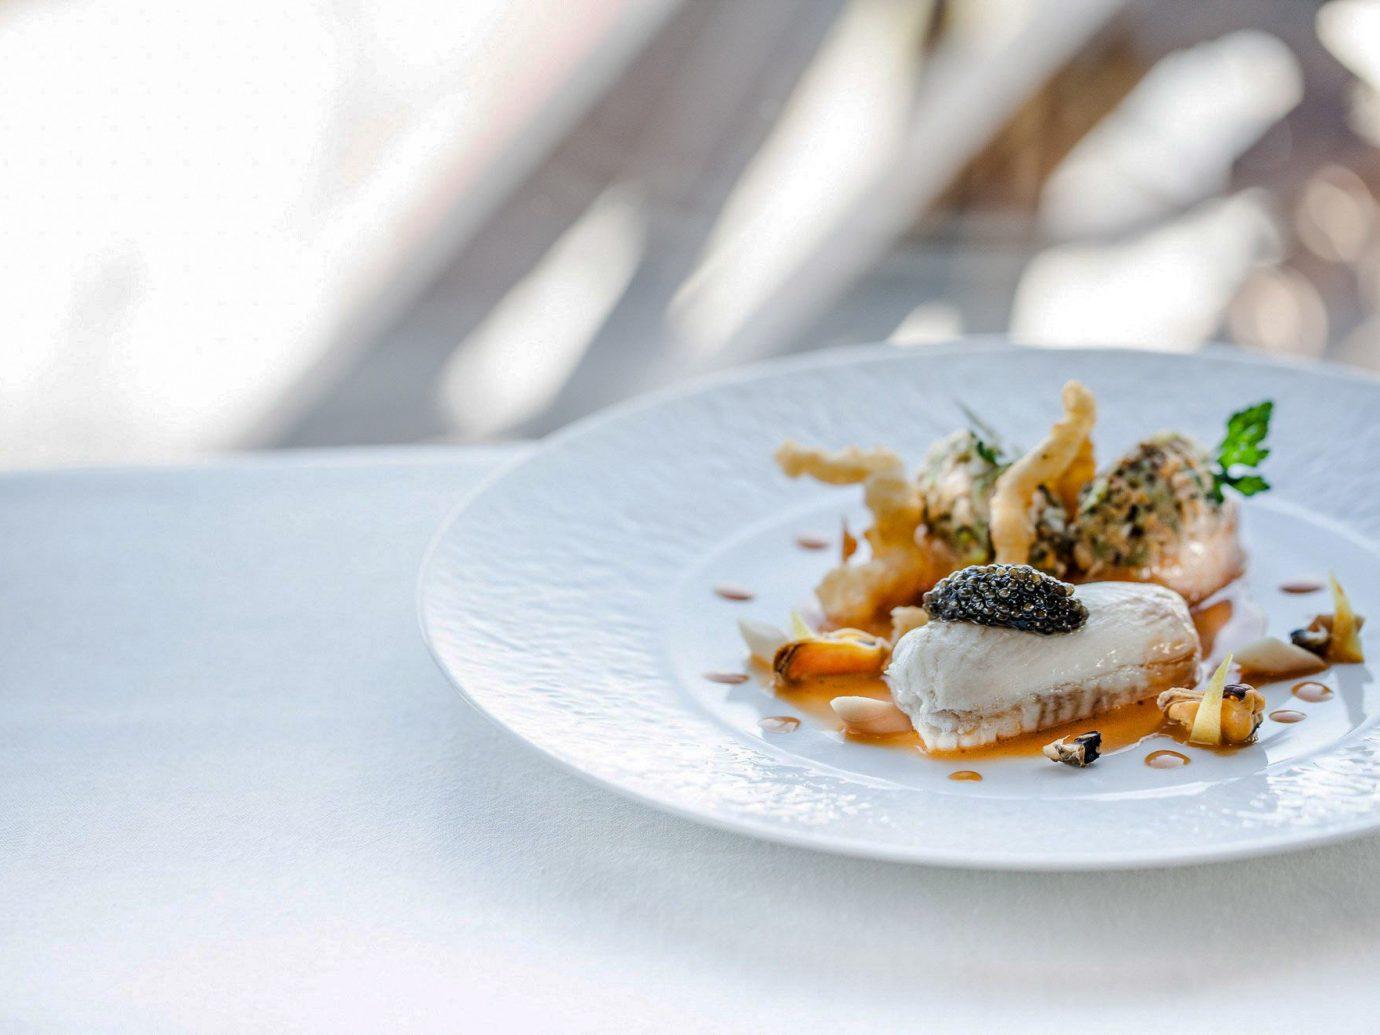 Food + Drink Romance plate dish white food dessert cuisine recipe